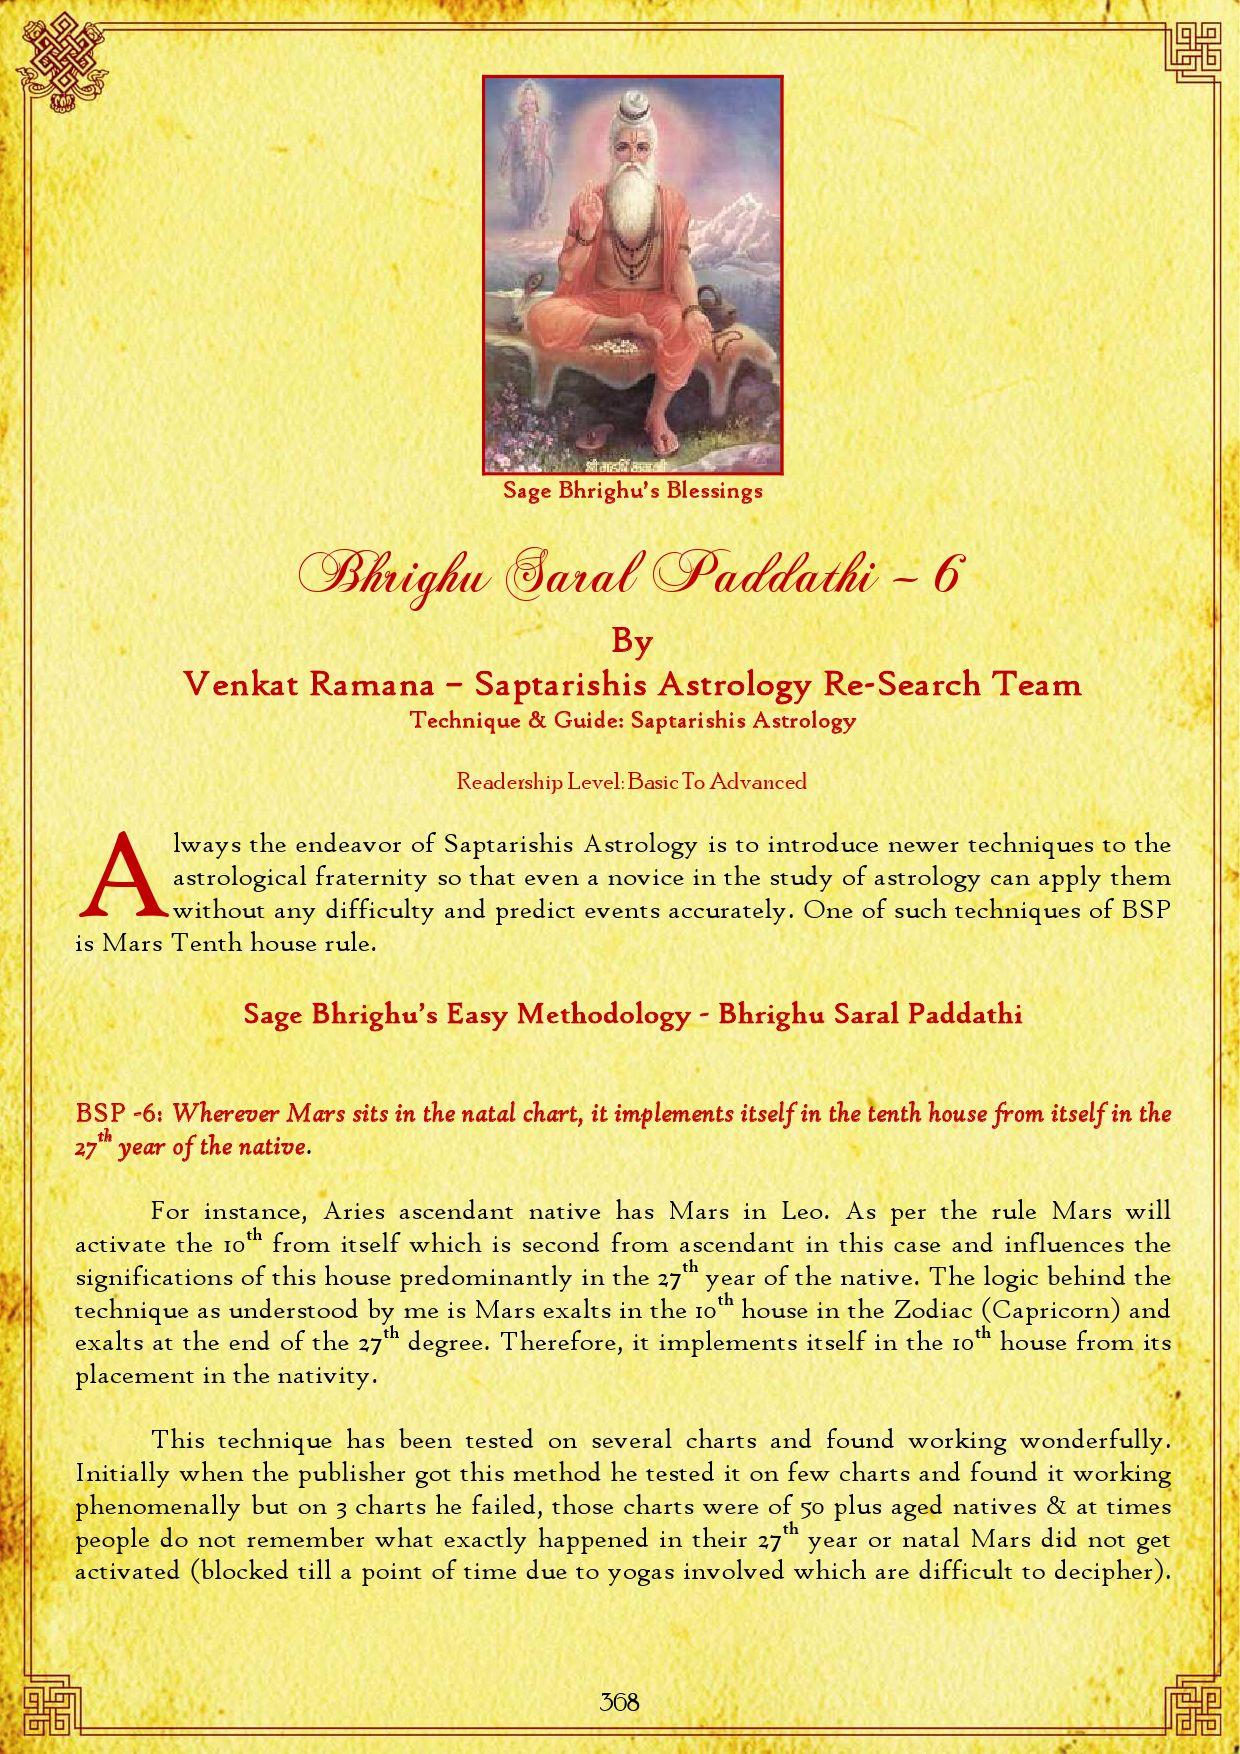 Microsoft Word - 35-Bhrighu Saral Paddathi – 6 by Saptarishis